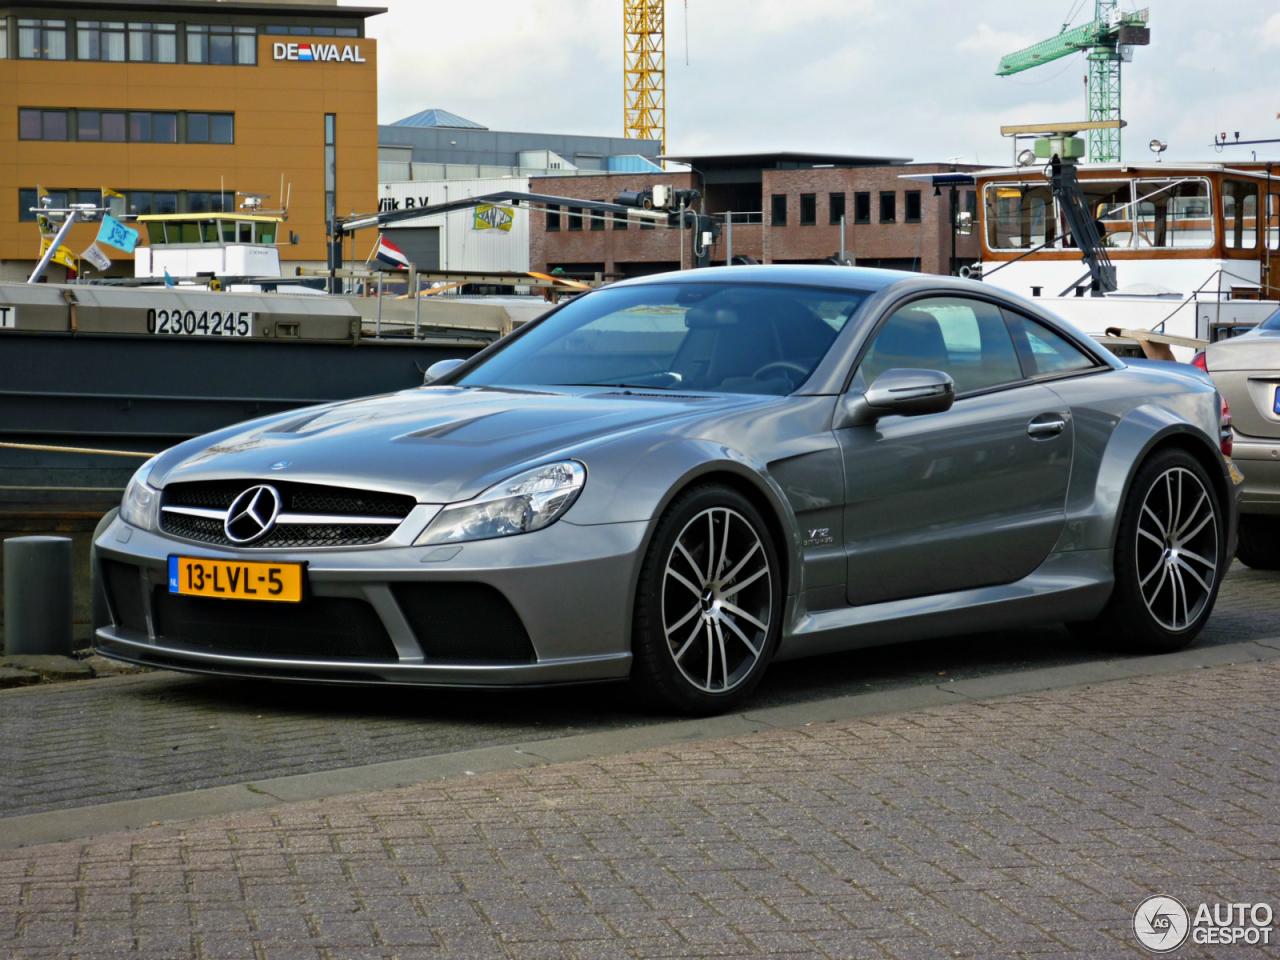 Mercedes benz sl 65 amg black series 18 december 2015 for Mercedes benz 5 series